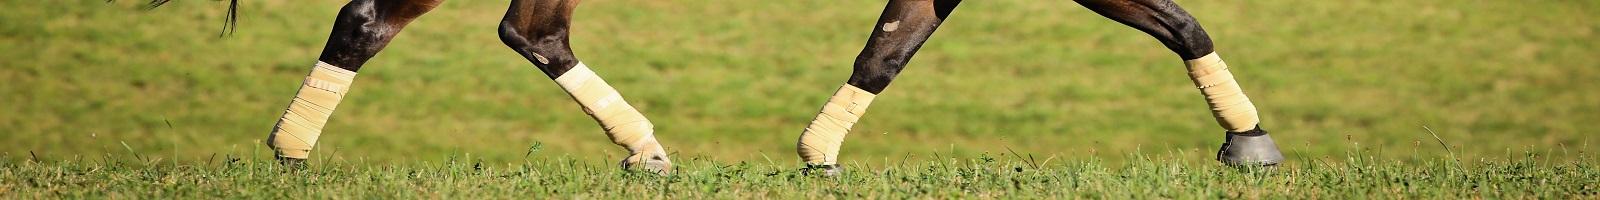 Bedarfsgerechte Pferdefütterung Ernährungsberatung Pferd Futterberatung Vorträge Reitunterricht Reitunterricht Franken Oberpfalz